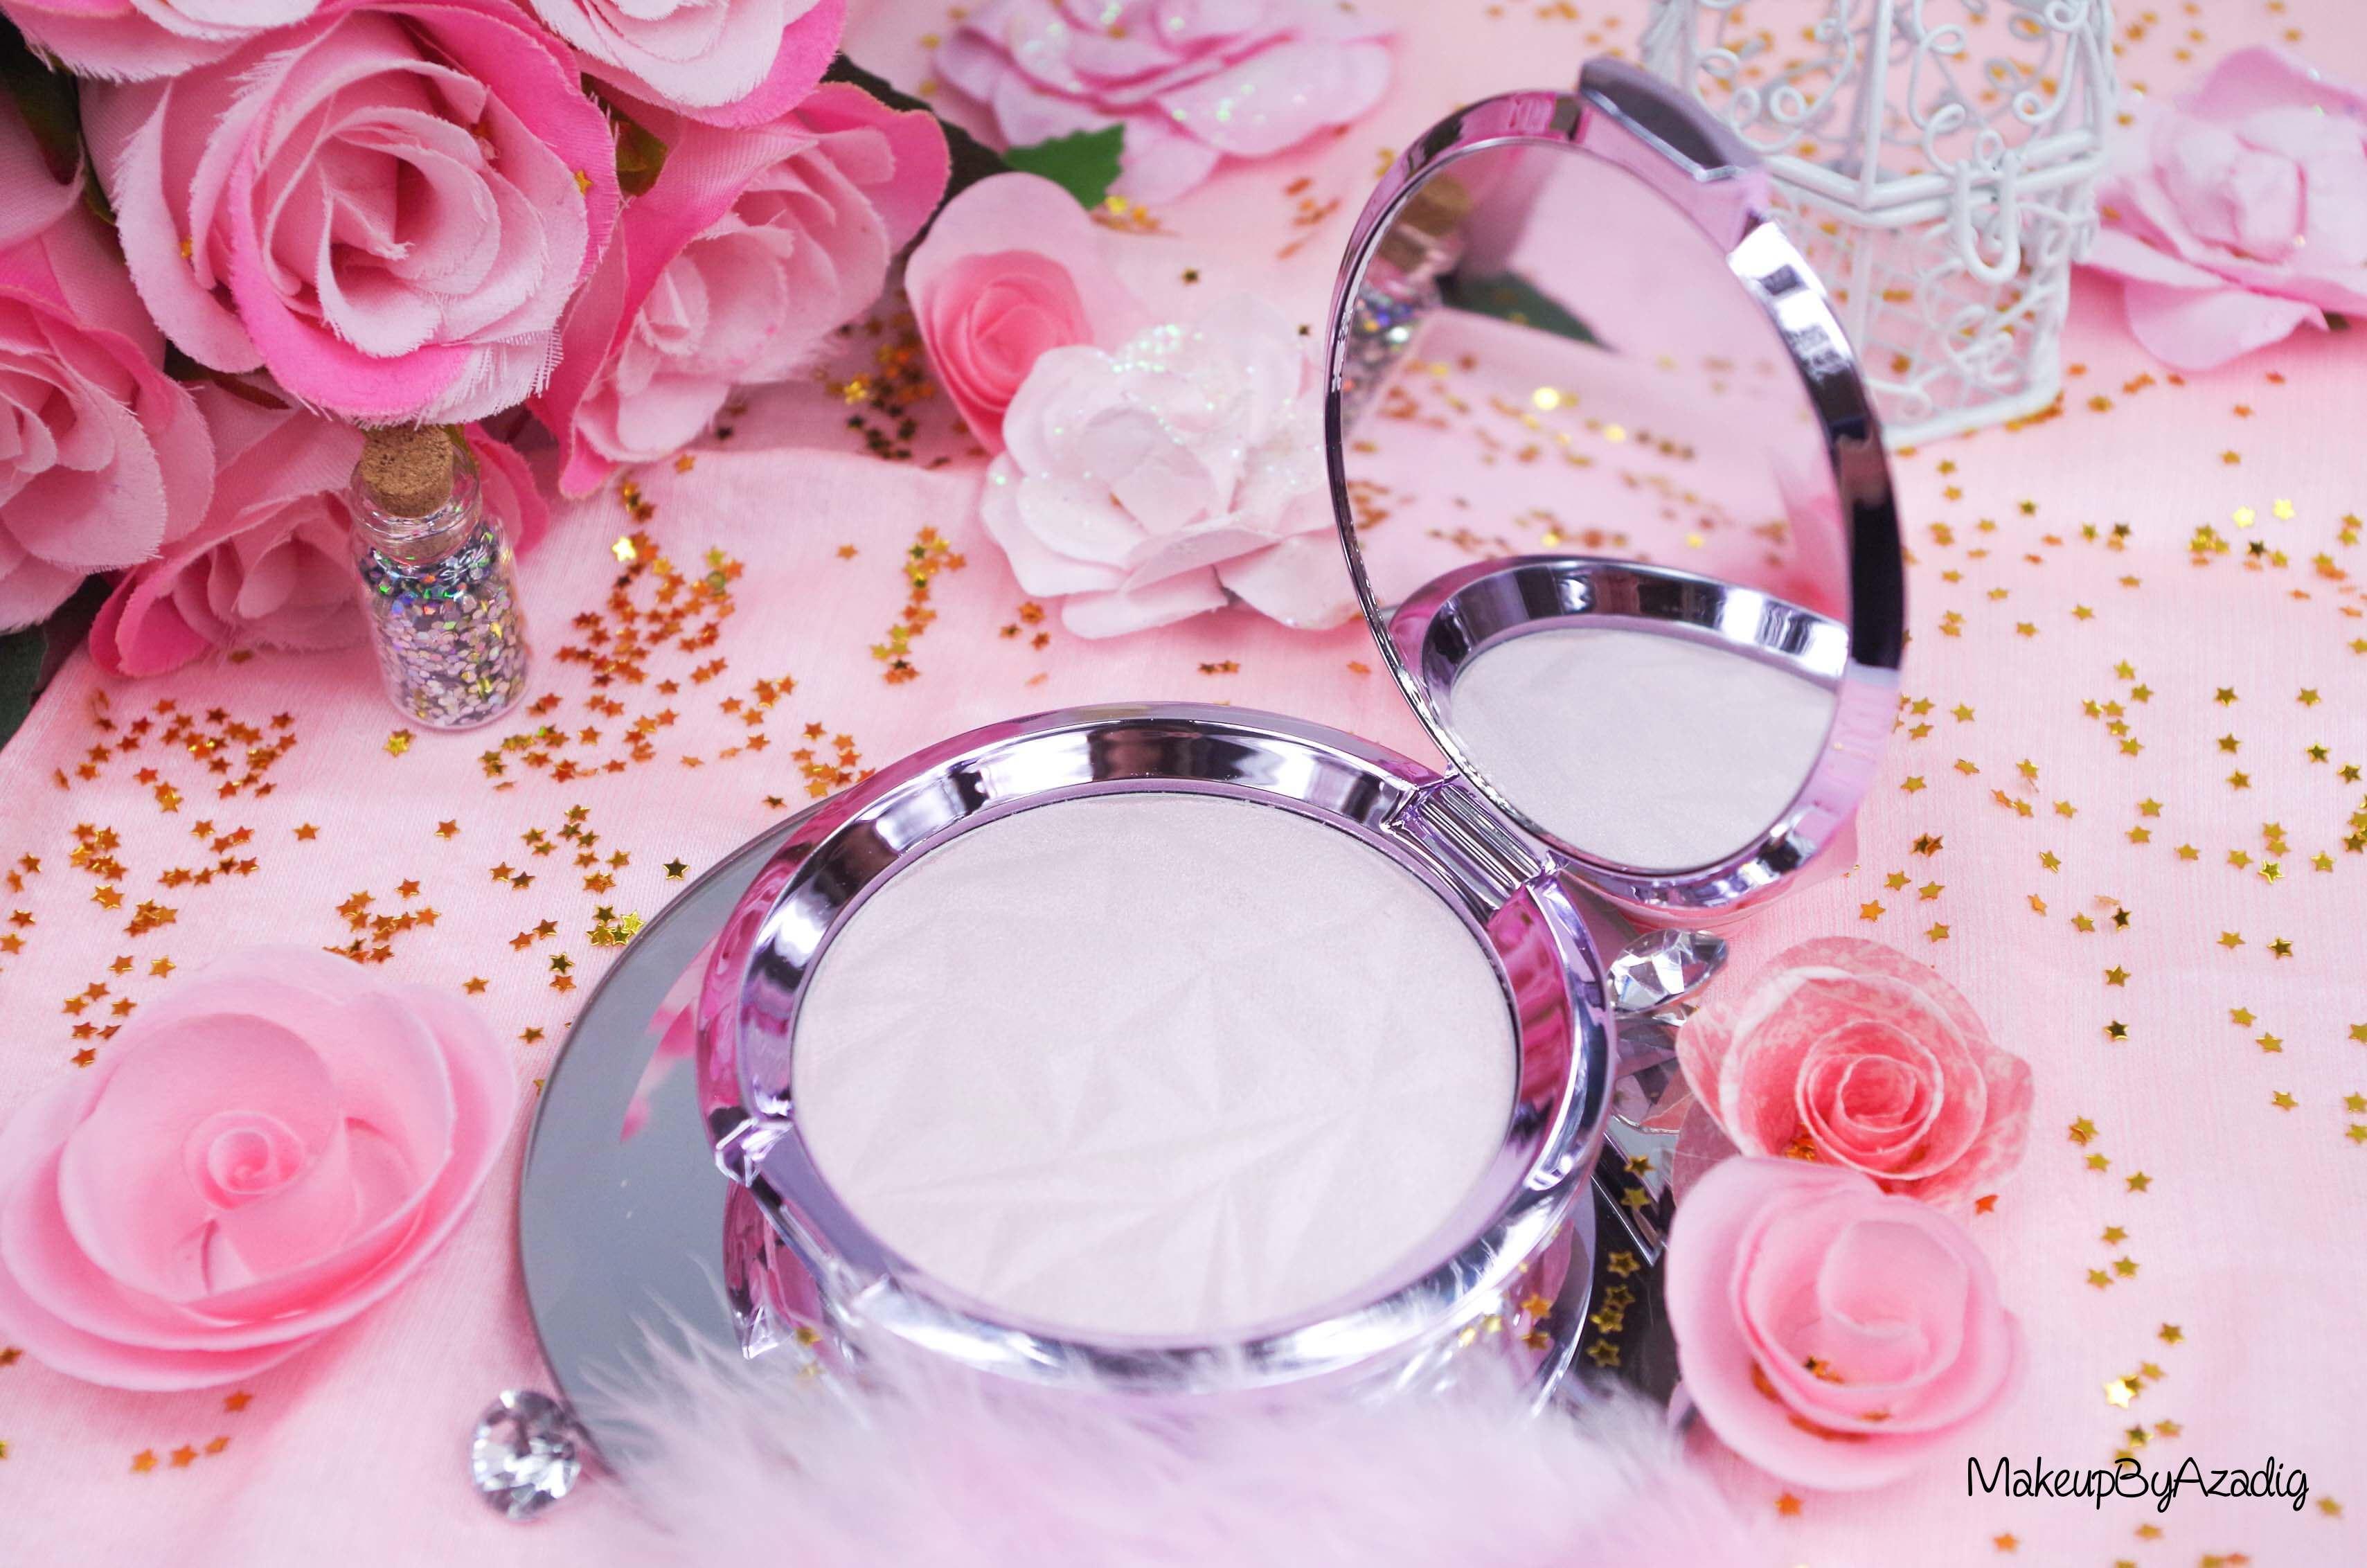 revue-becca-shimmering-skin-perfector-pressed-highlighter-enlumineur-violet-prismatic-amethyst-avis-swatch-prix-makeupbyazadig-light